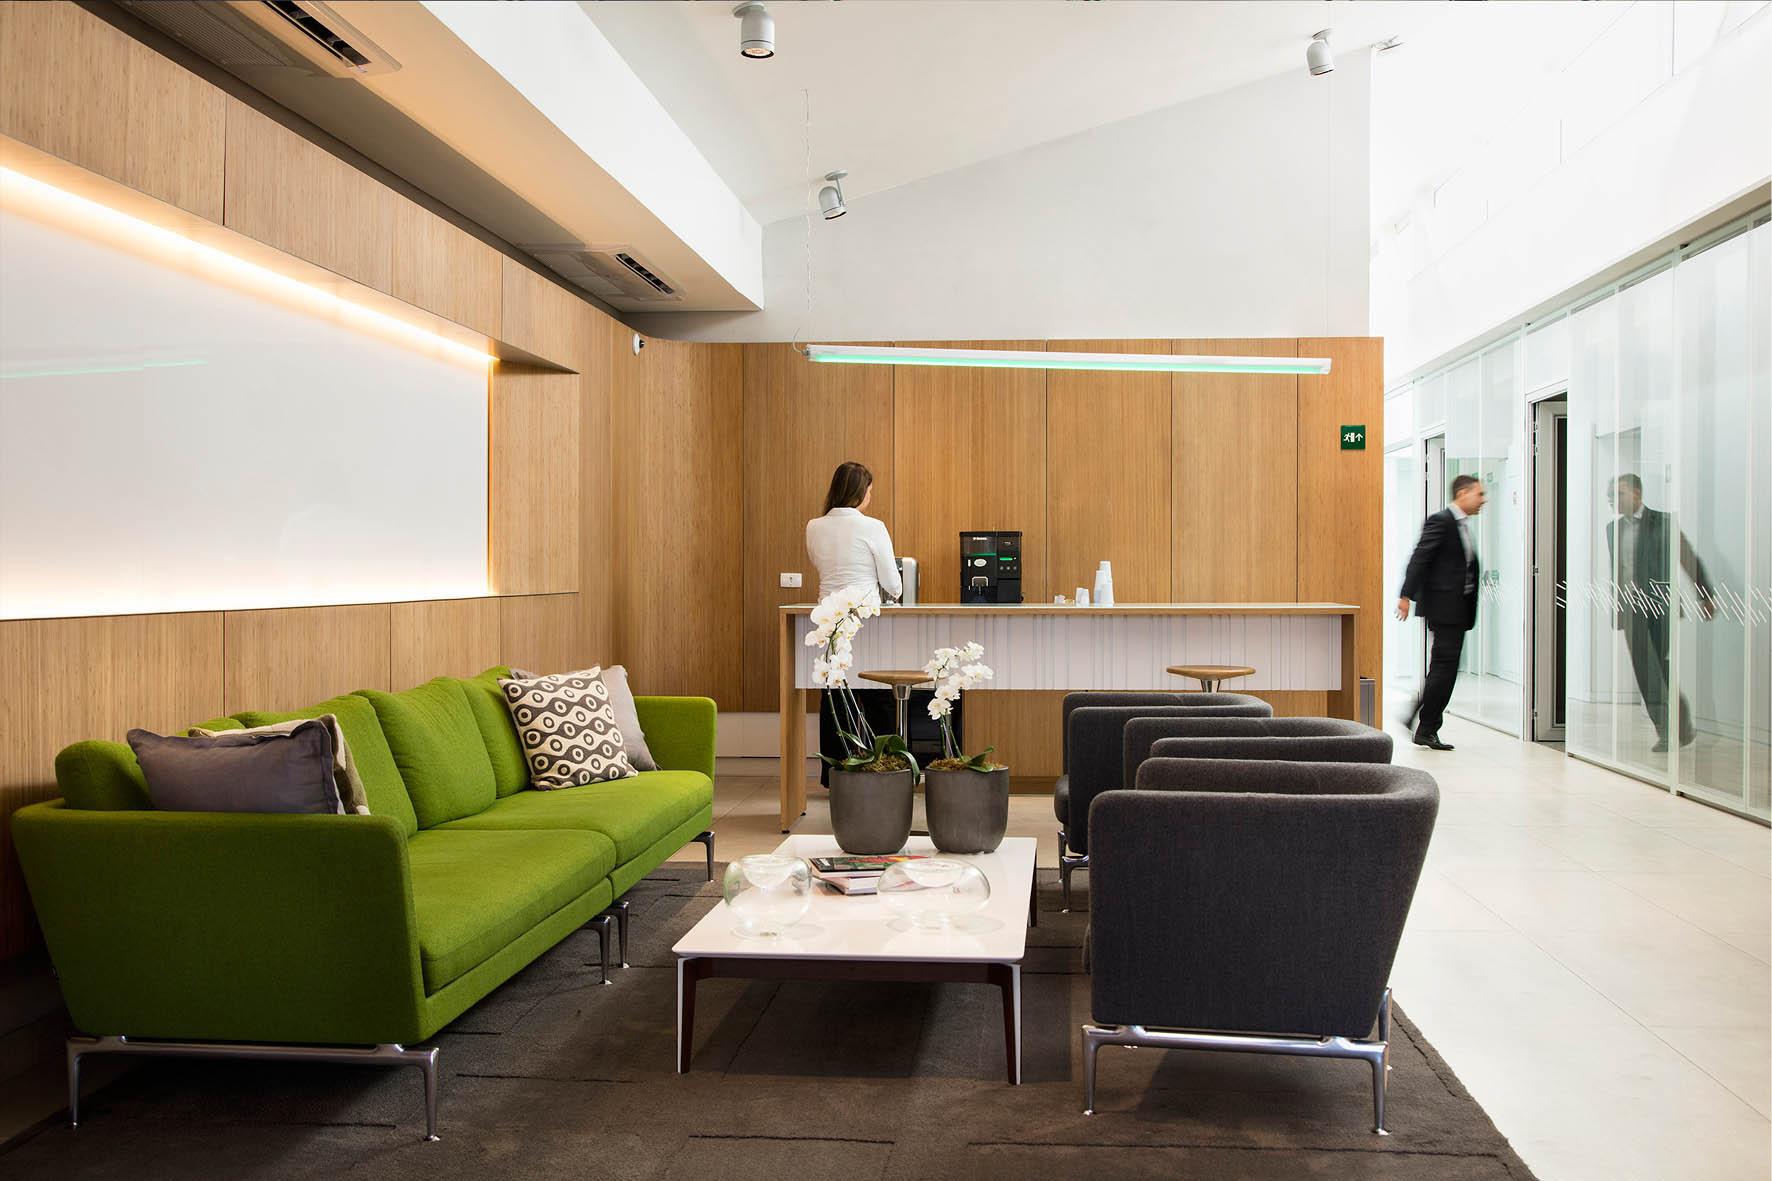 projeto banco original mgoes arquitetura design. Black Bedroom Furniture Sets. Home Design Ideas